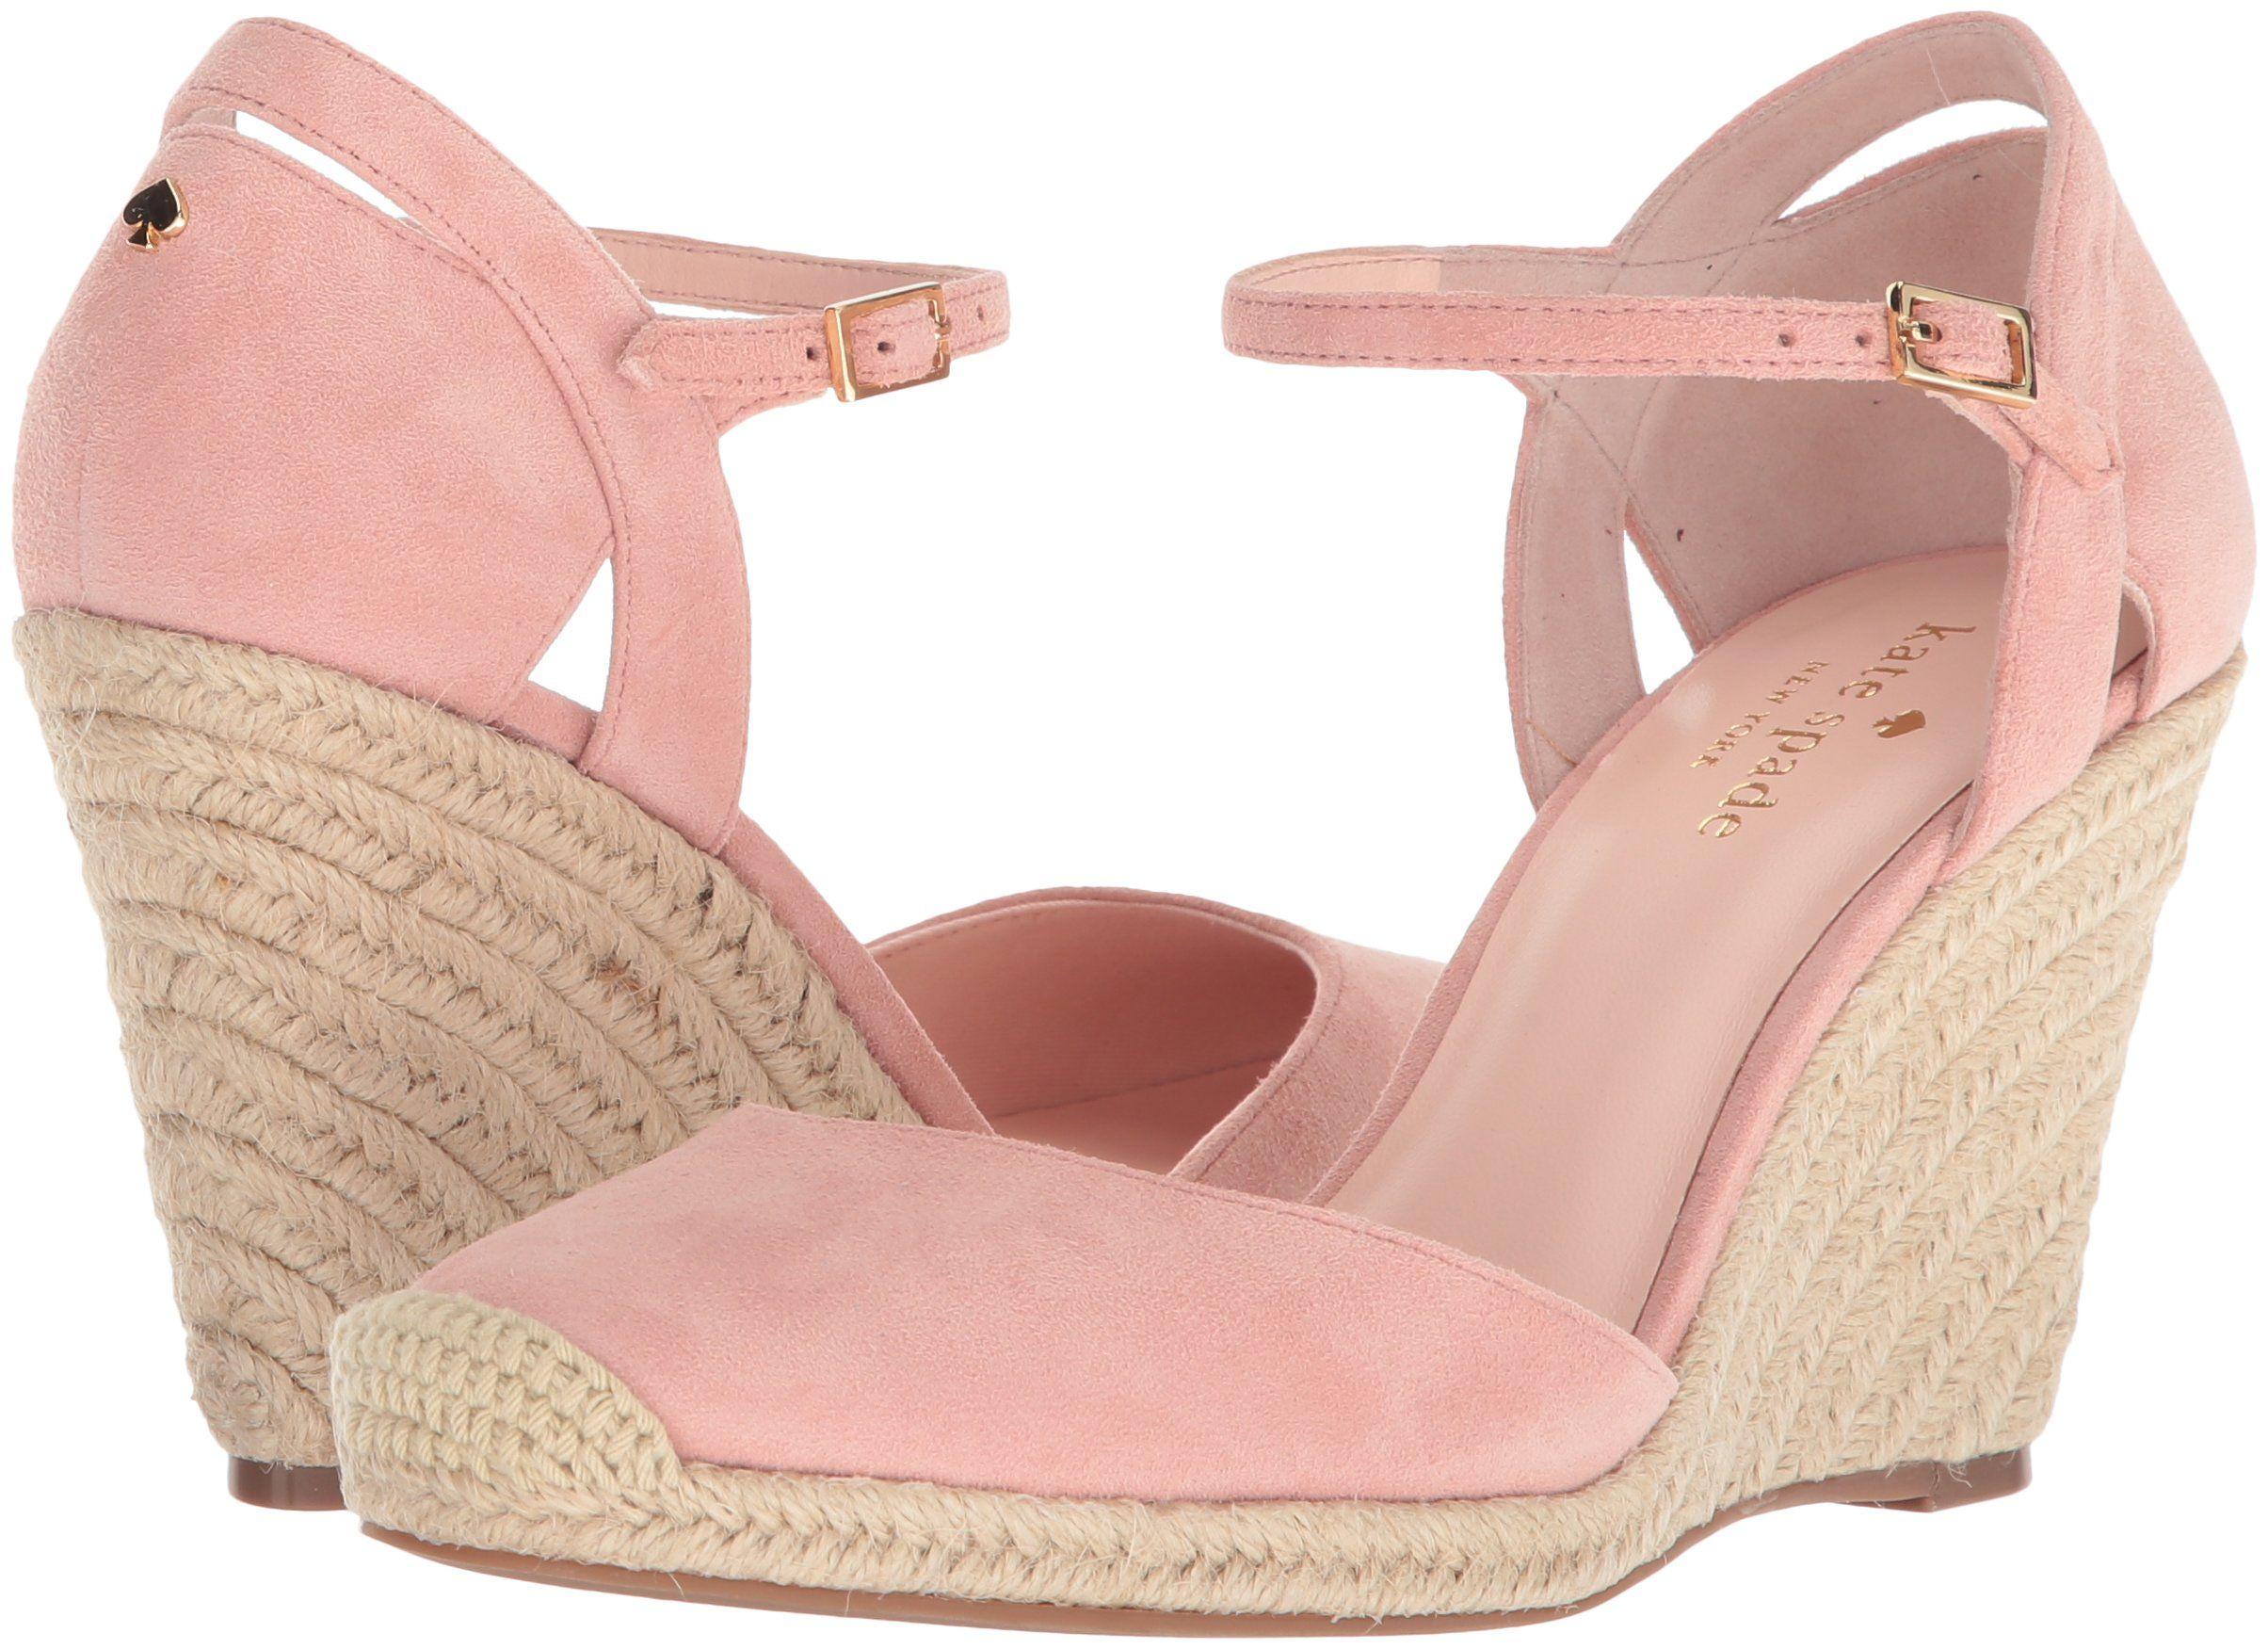 94f45702ca0 Kate Spade New York Womens Giovanna Espadrille Wedge Sandal Pink ...